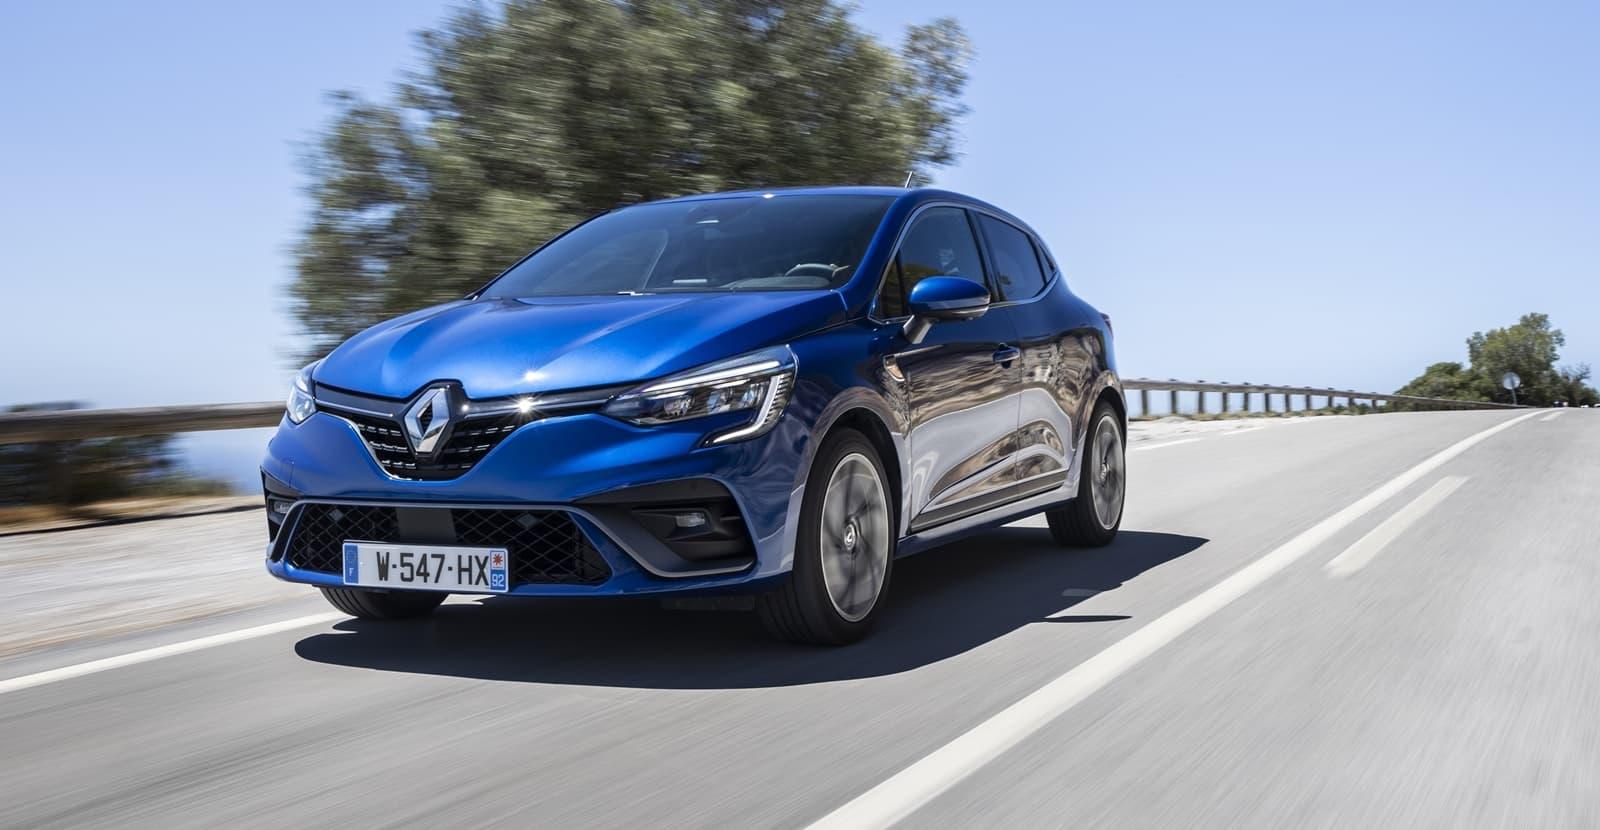 Renault Clio 2020 Prueba 0619 026